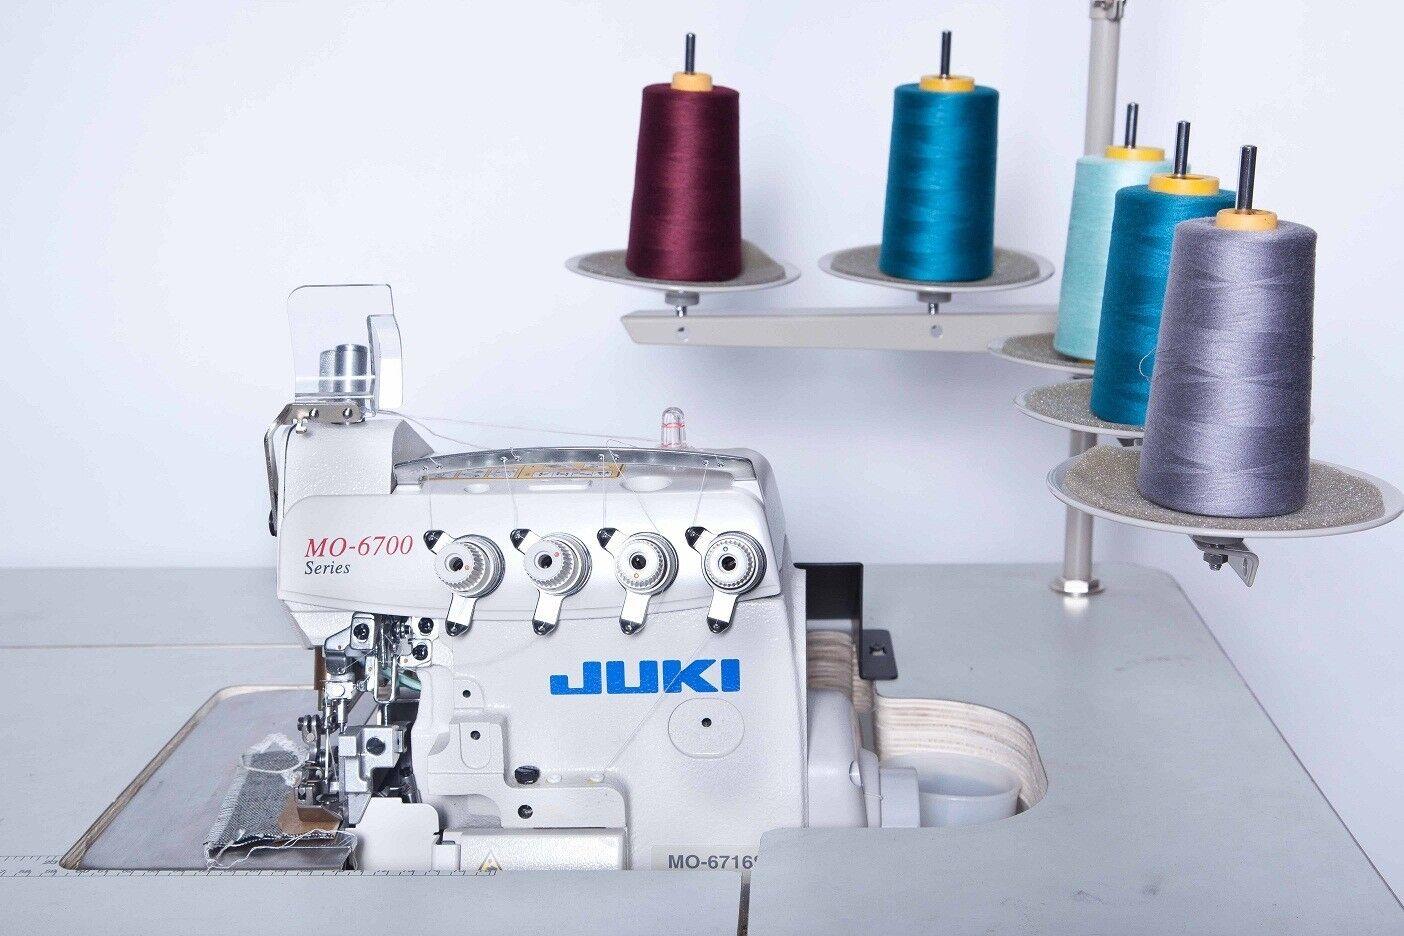 Juki 5 Thread Overlock Sewing Machine W Table Servo Motor Mo Atlas Threading Diagram 6716s Compelete